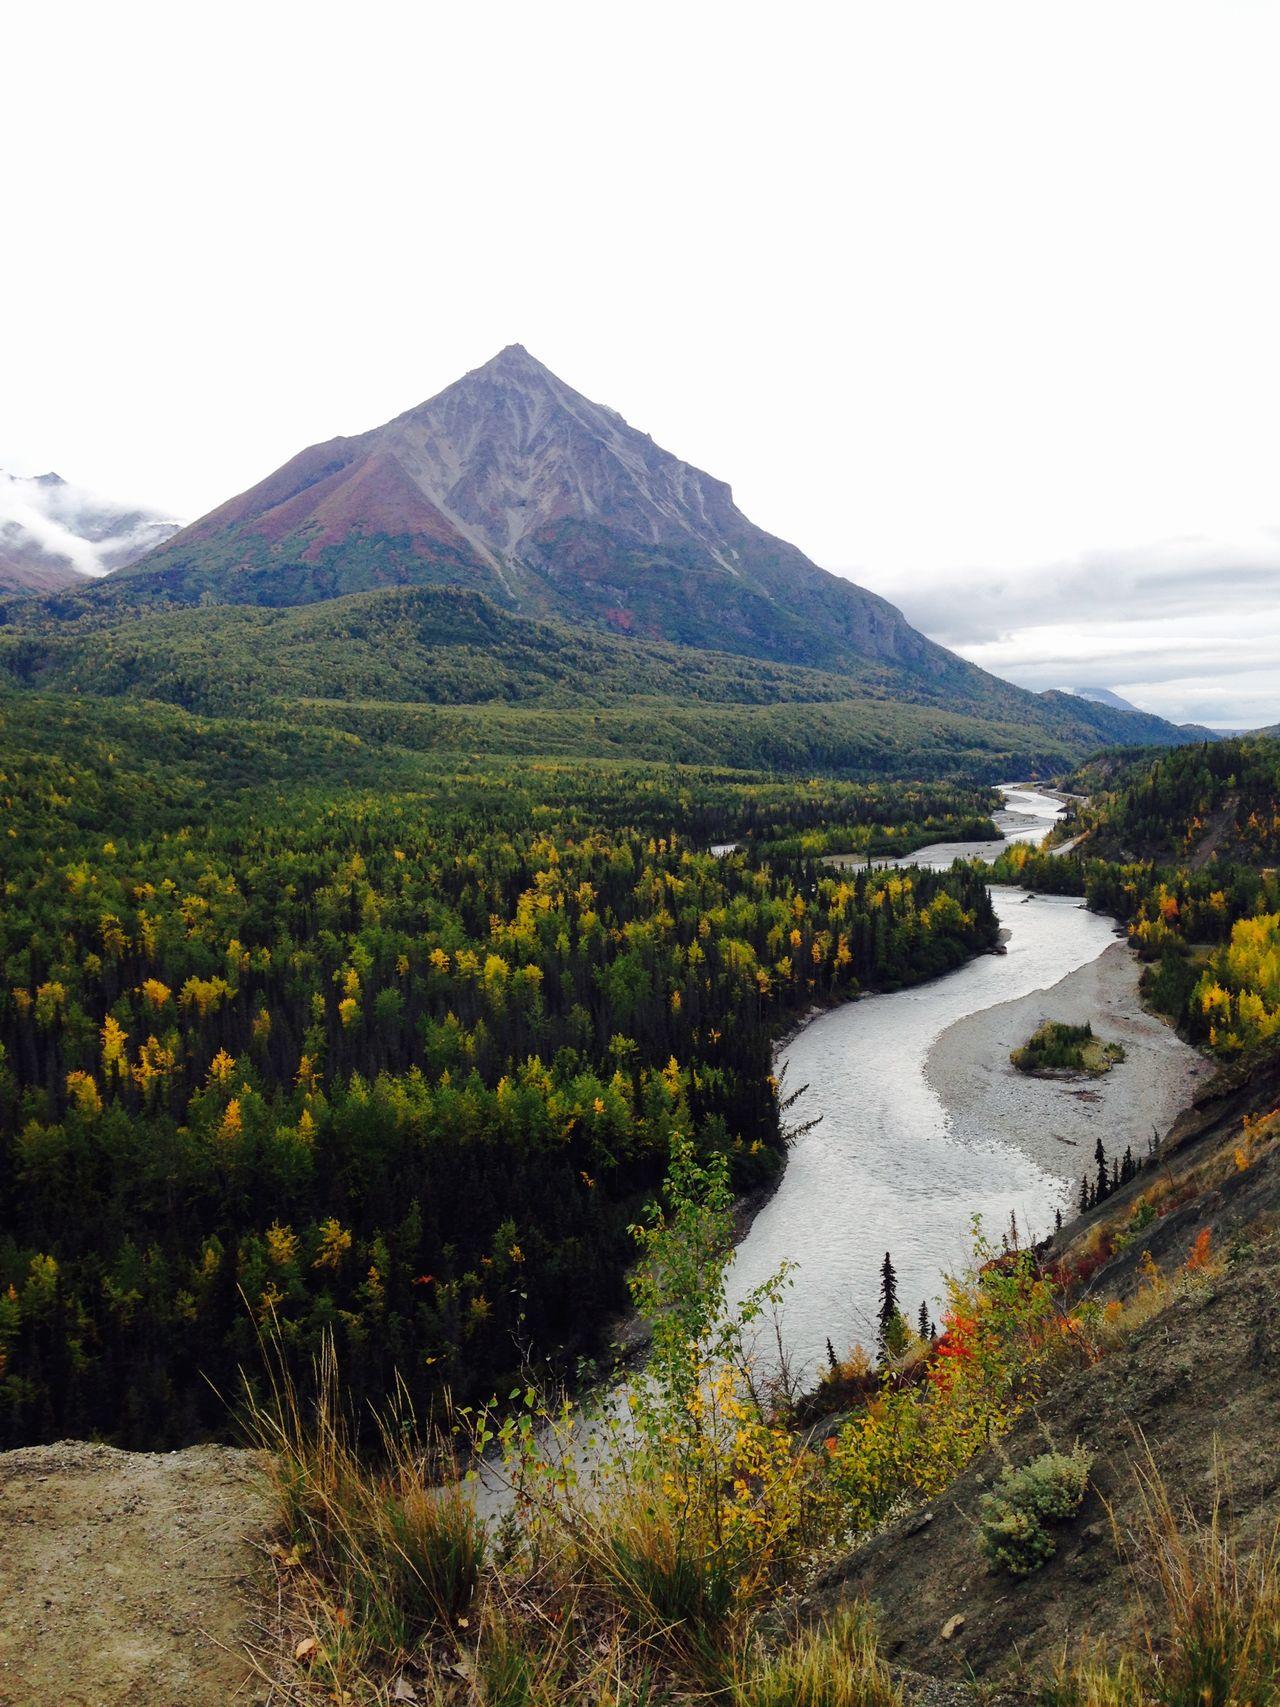 Edge Of The World Anchorage Great Views Alaska 907 Ak  I Love Alaska My Alaska Into The Wild Mountains